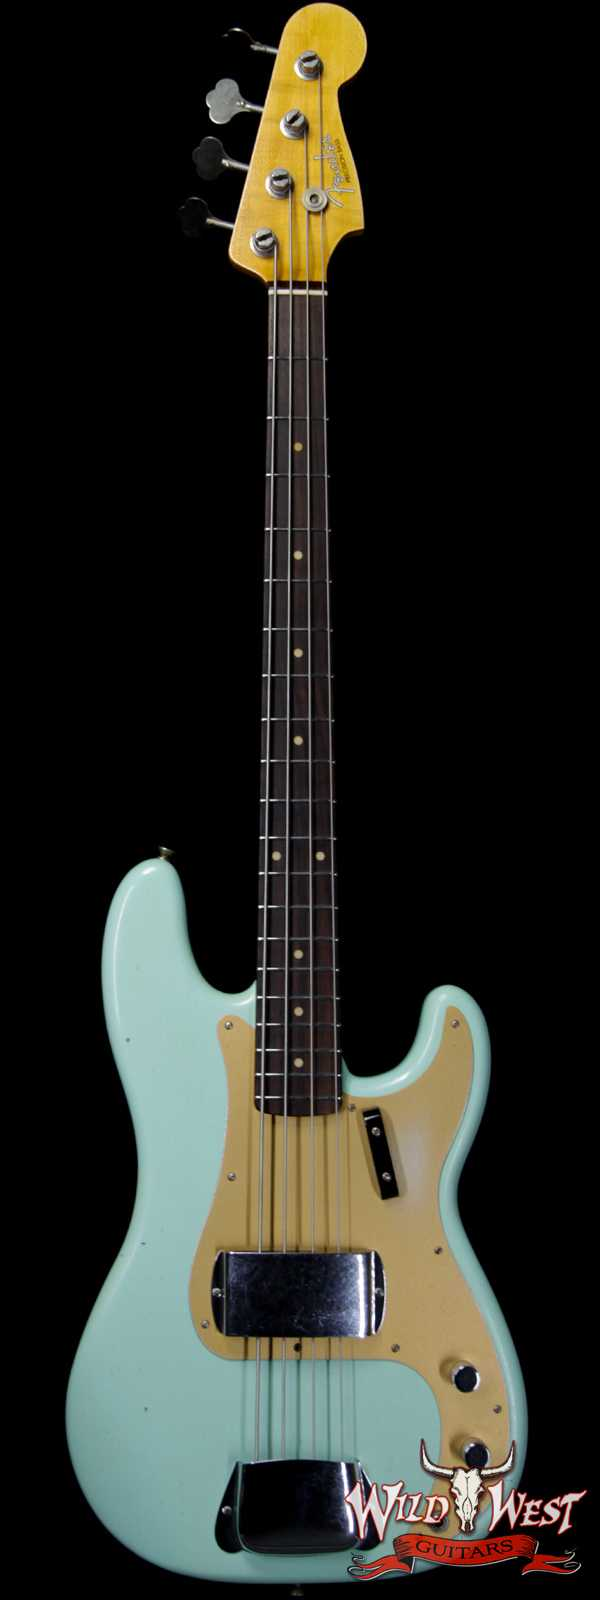 Fender Custom Shop 1959 Precision Bass Journeyman Relic AAA Rosewood Slab Board Handwound PU Surf Green